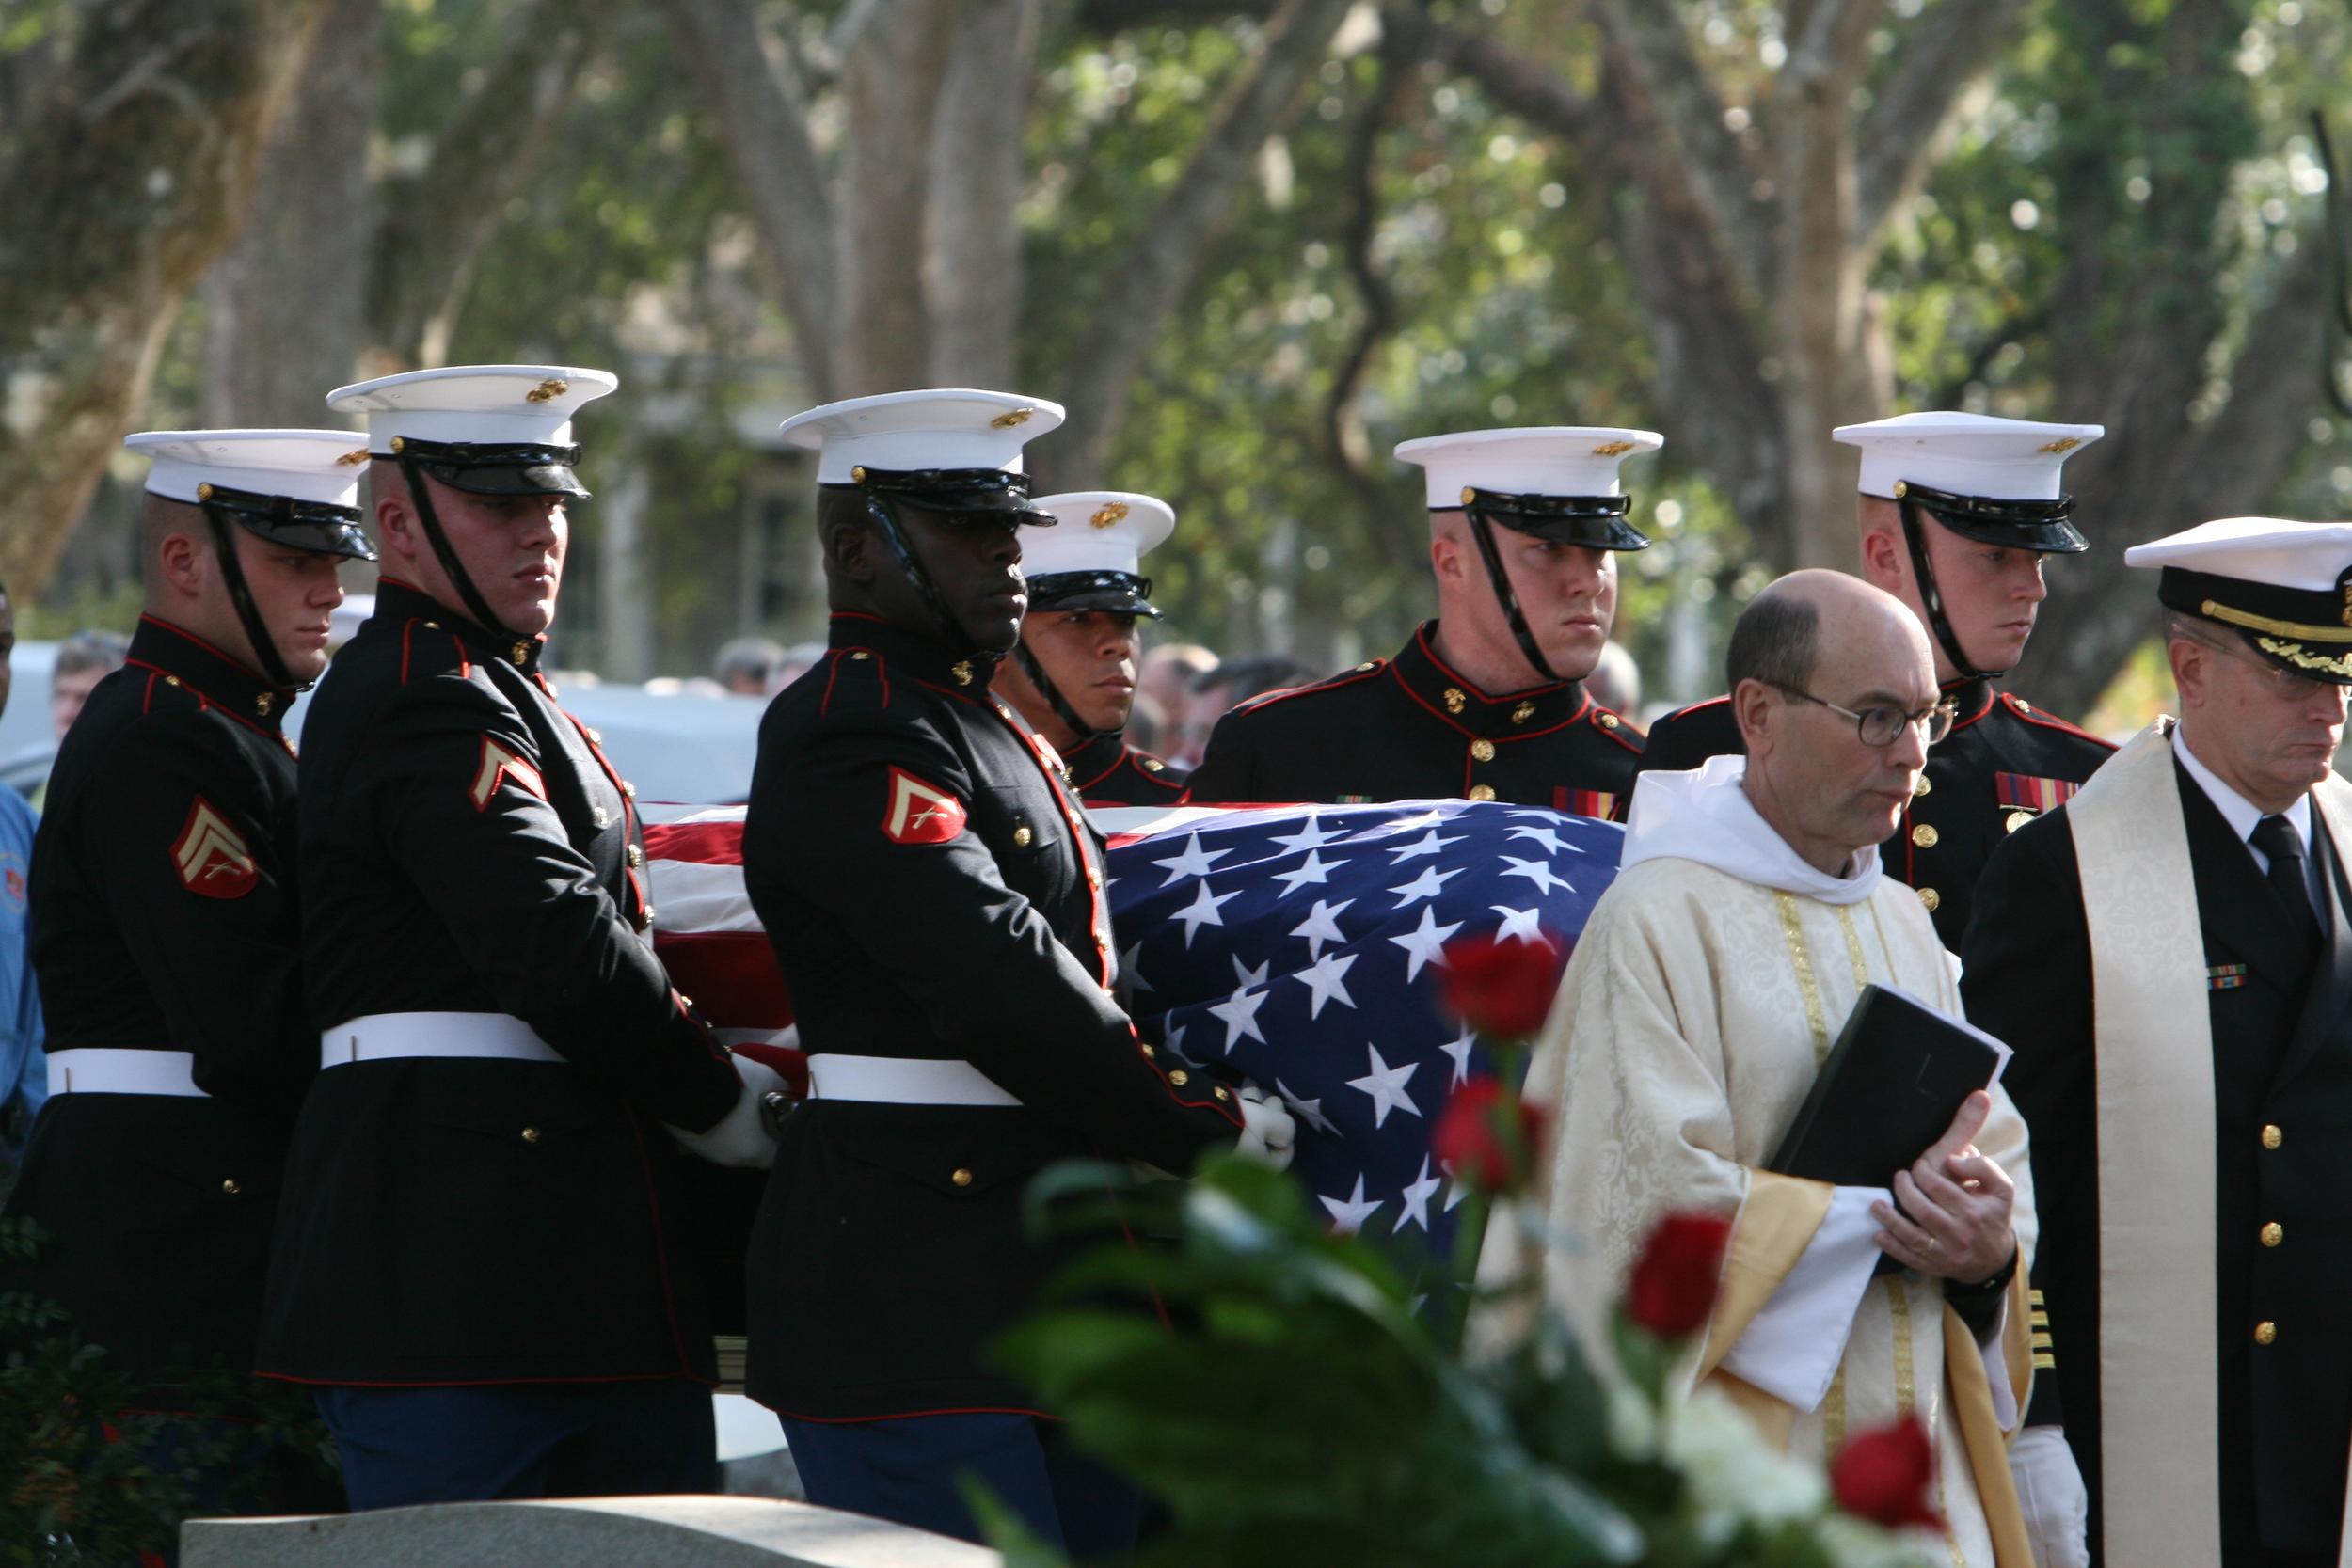 Military funeral. (Sgt. John J. Parry, USMC Photo)